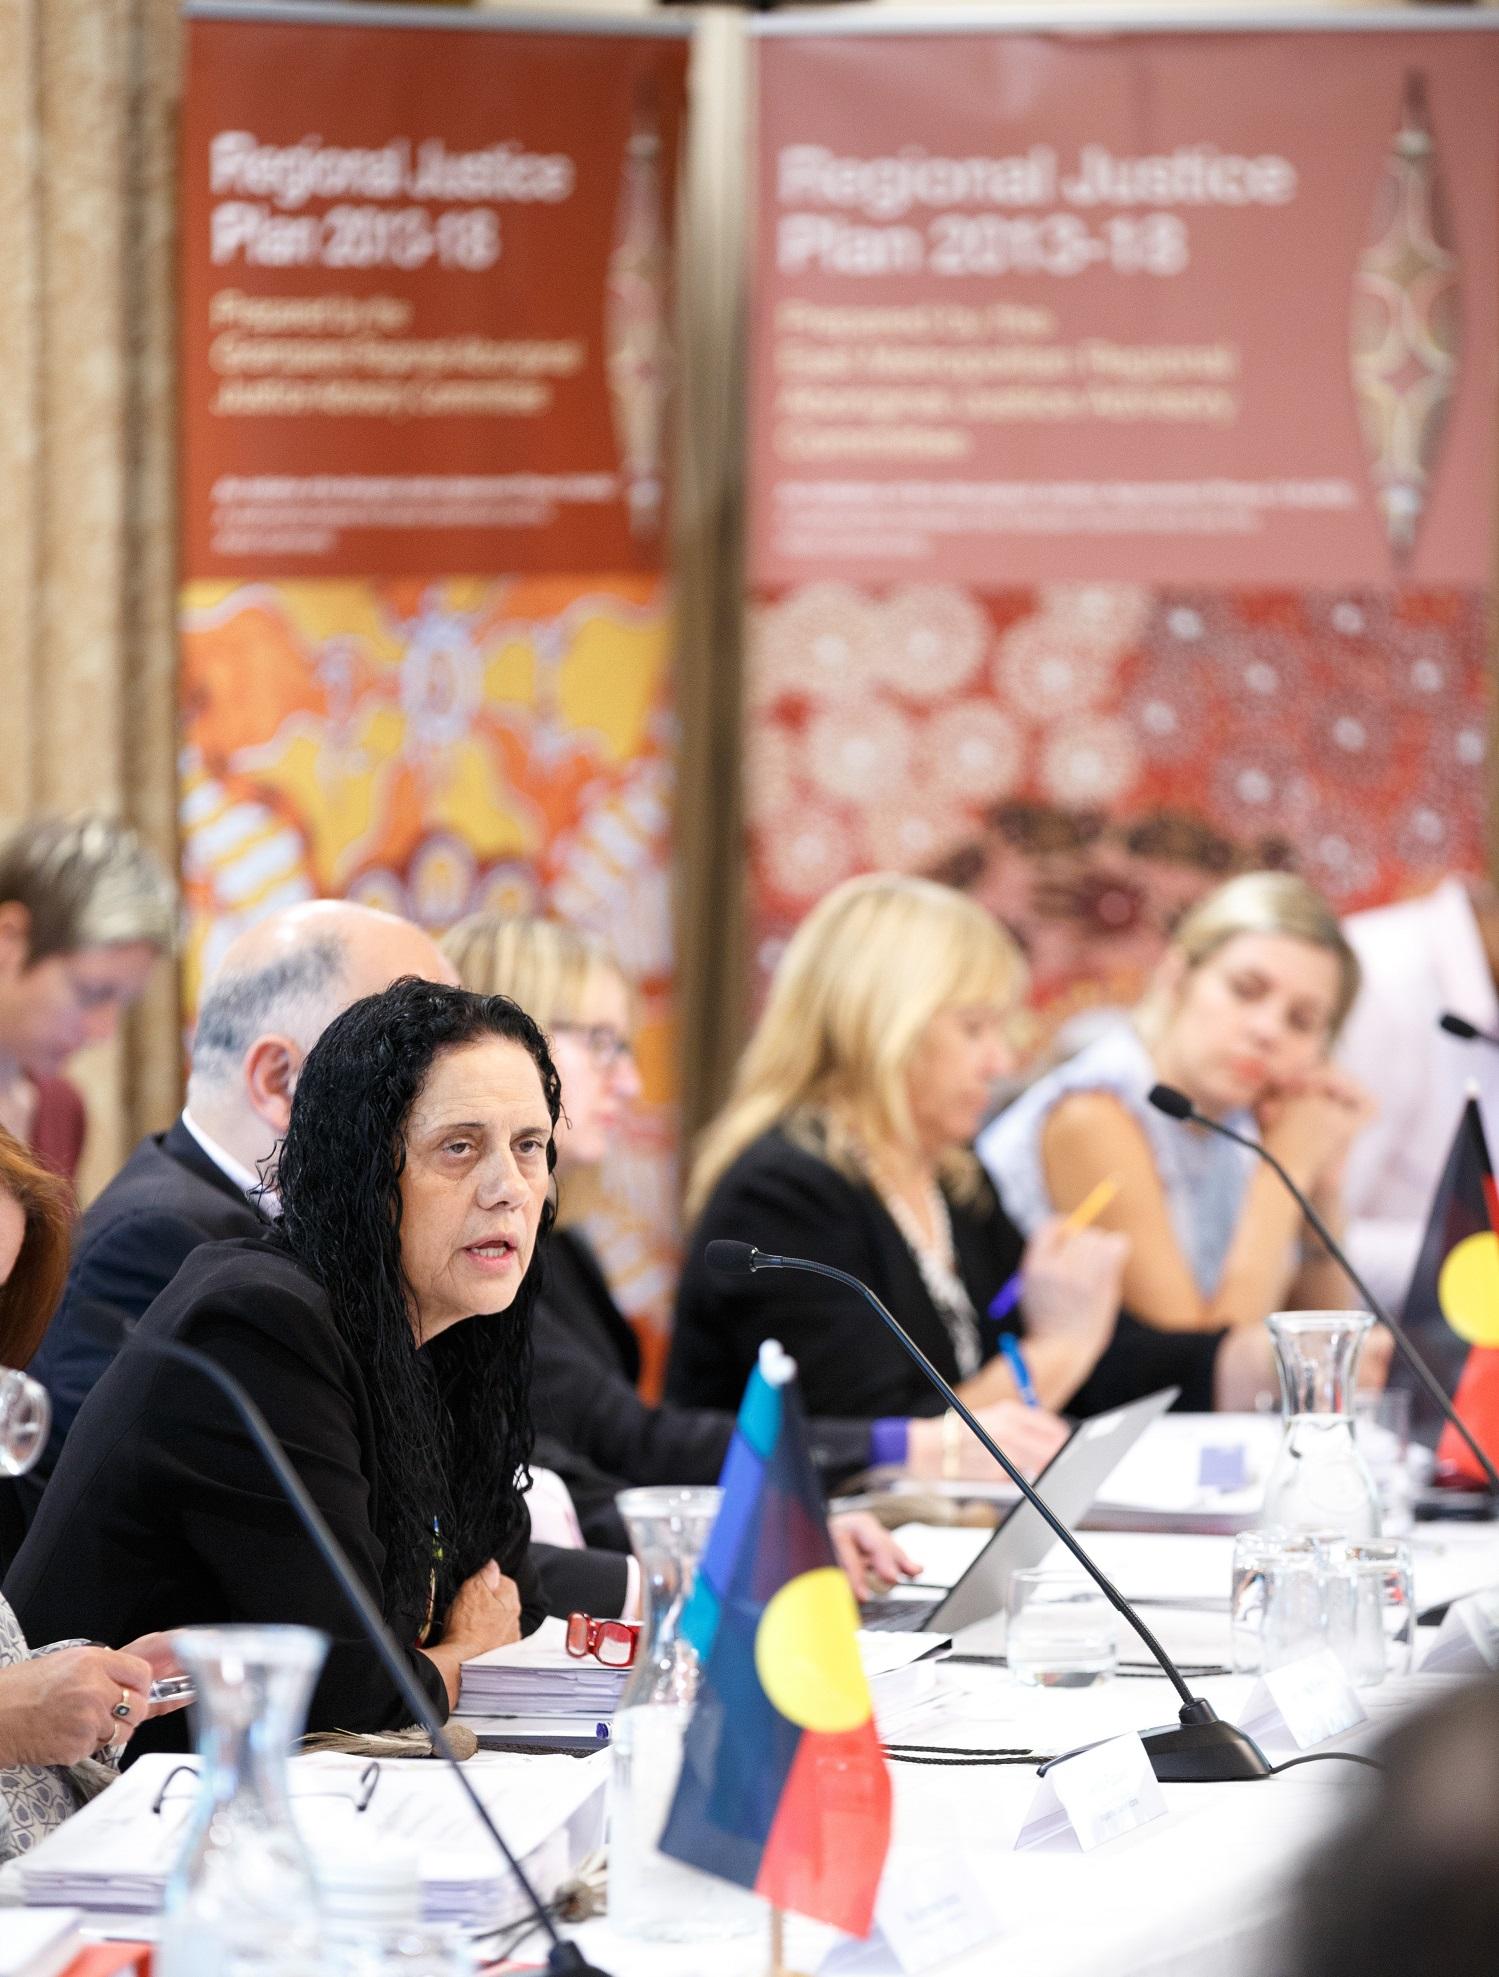 Image of AJF member Muriel Bamblett